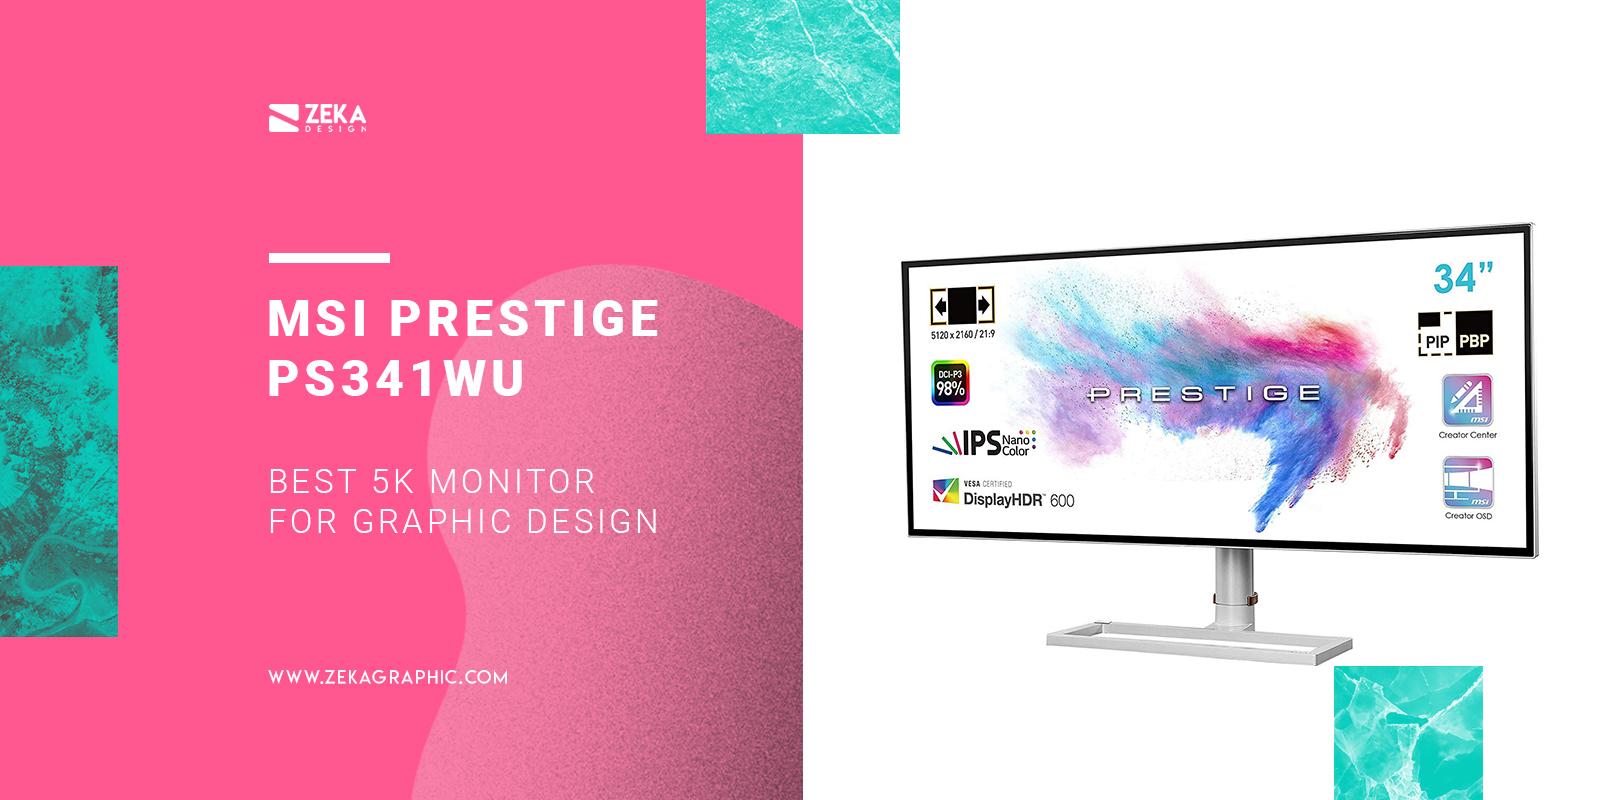 MSI Prestige PS341WU Best 5K Monitor for Graphic Design